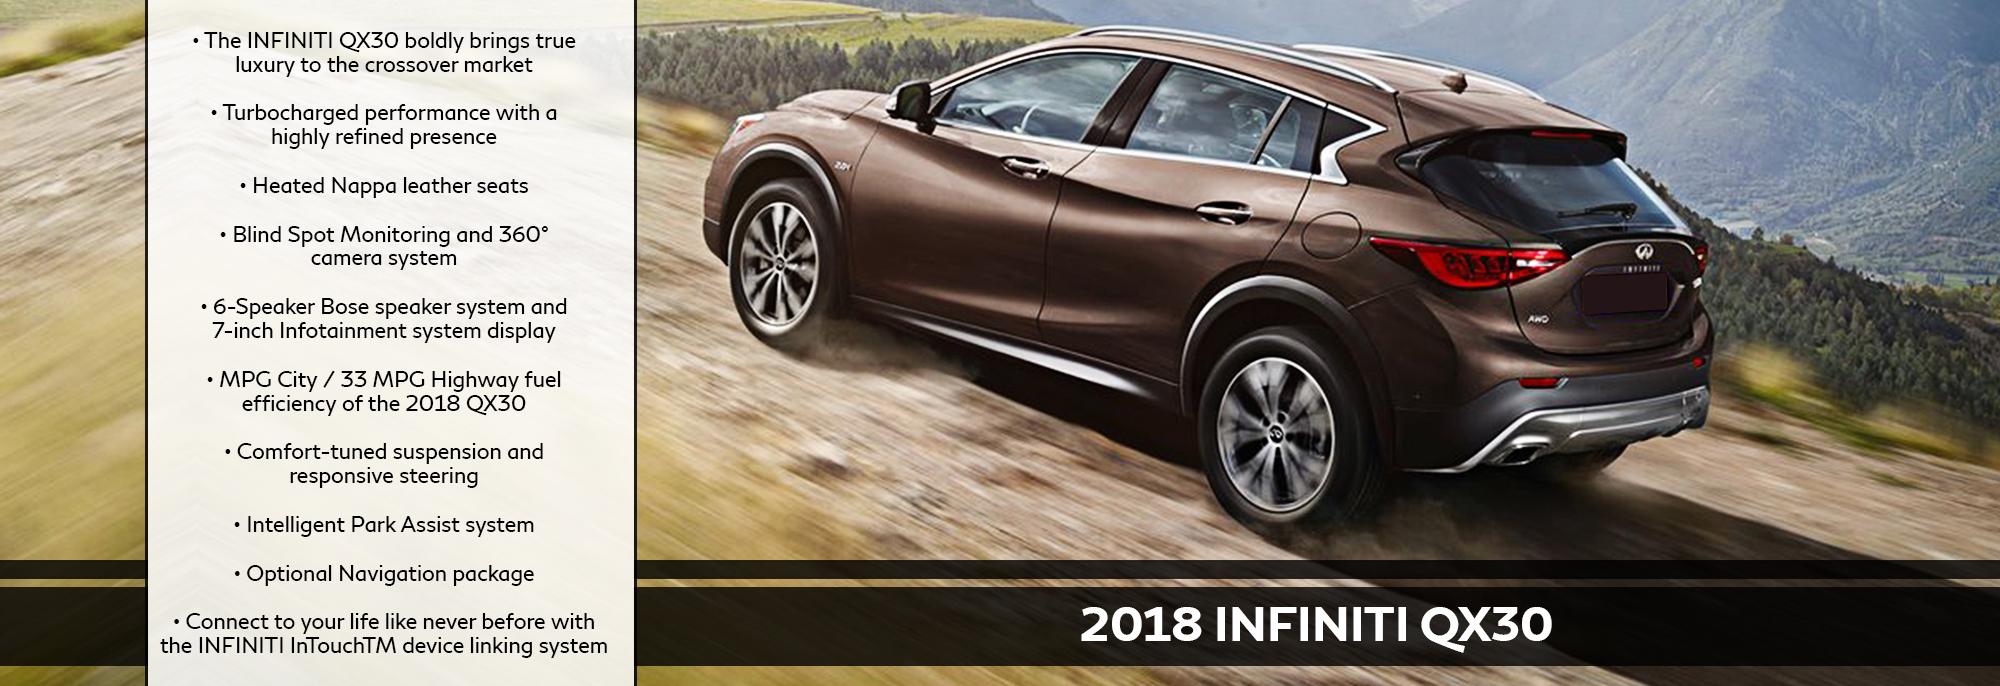 New 2018 INFINITI QX30 Offer